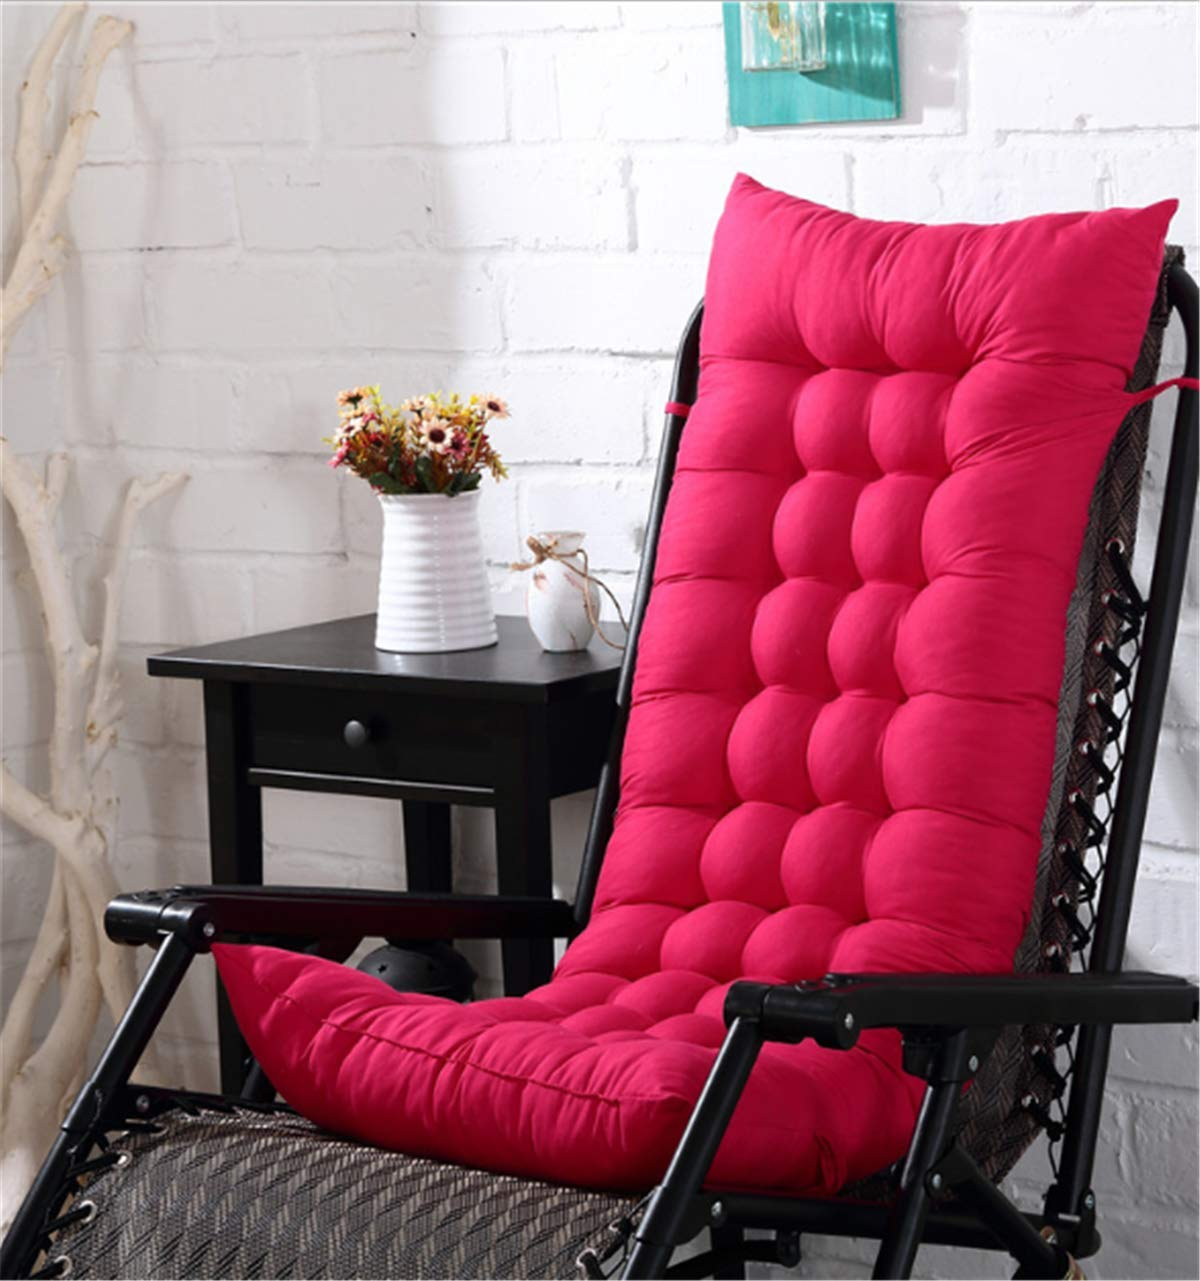 Marbeine – Cojín para silla de relax, tumbona de jardín, terraza, rosa: Amazon.es: Jardín